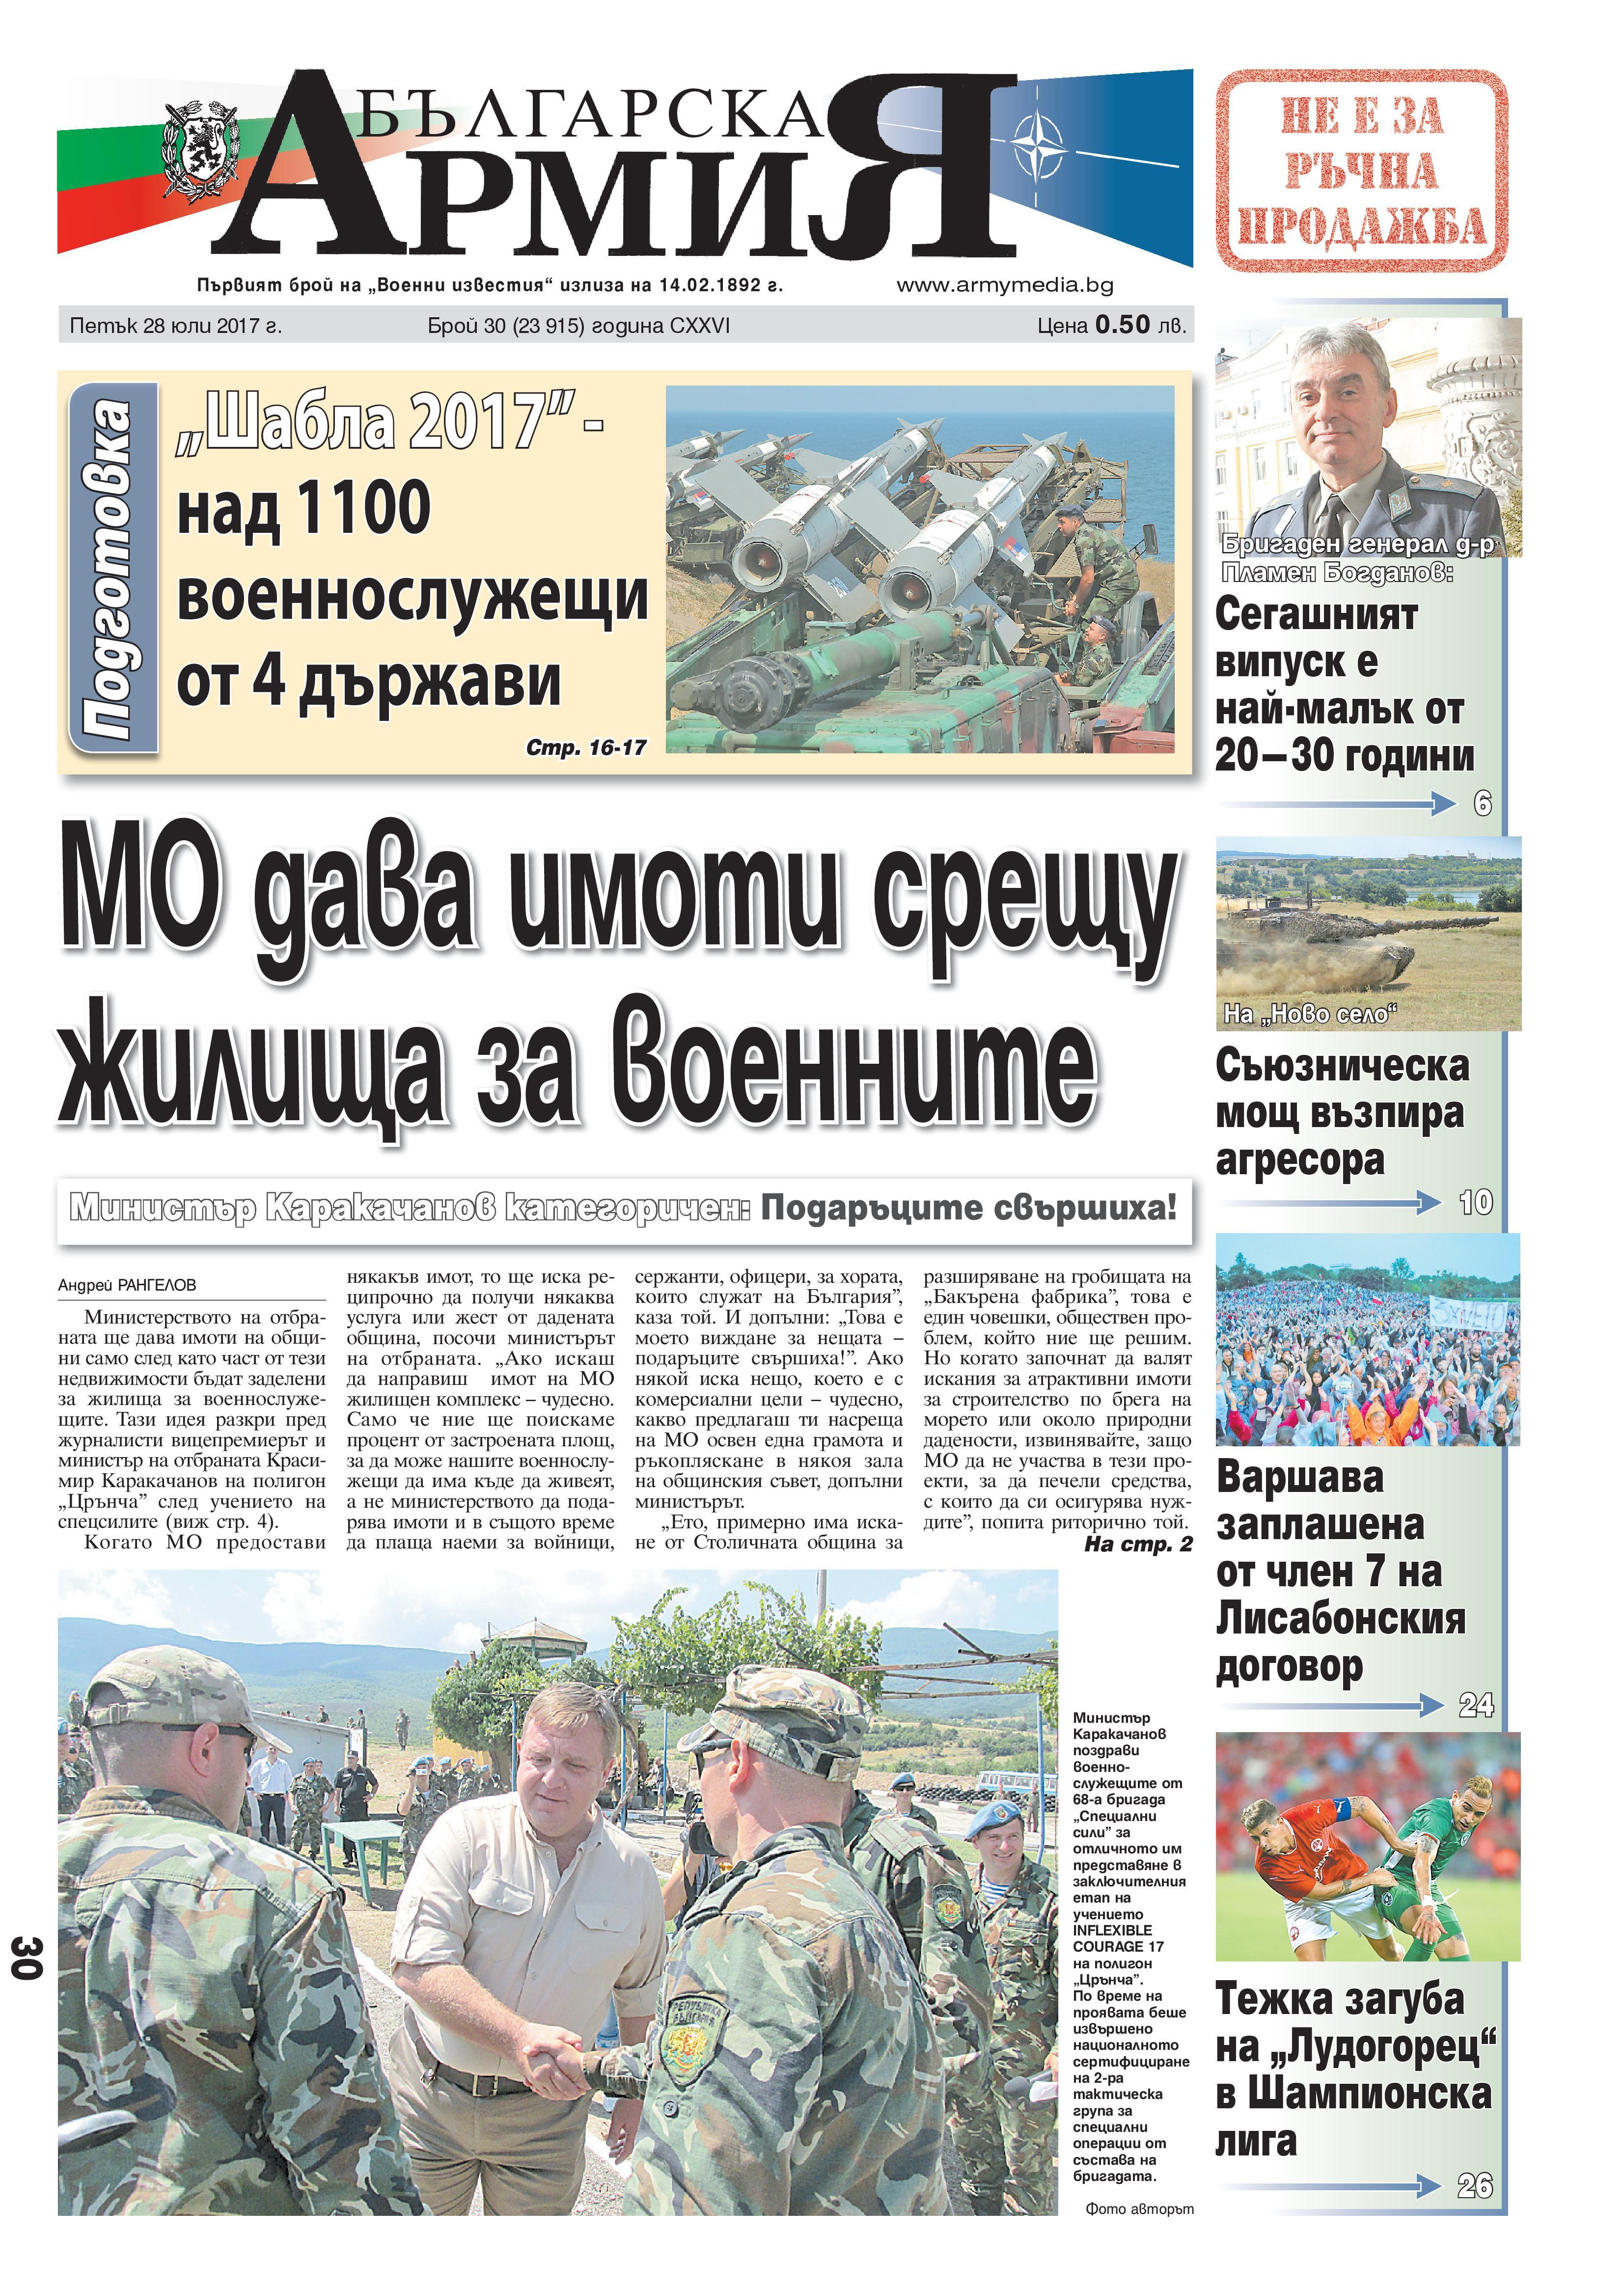 https://www.armymedia.bg/wp-content/uploads/2015/06/01-6.jpg